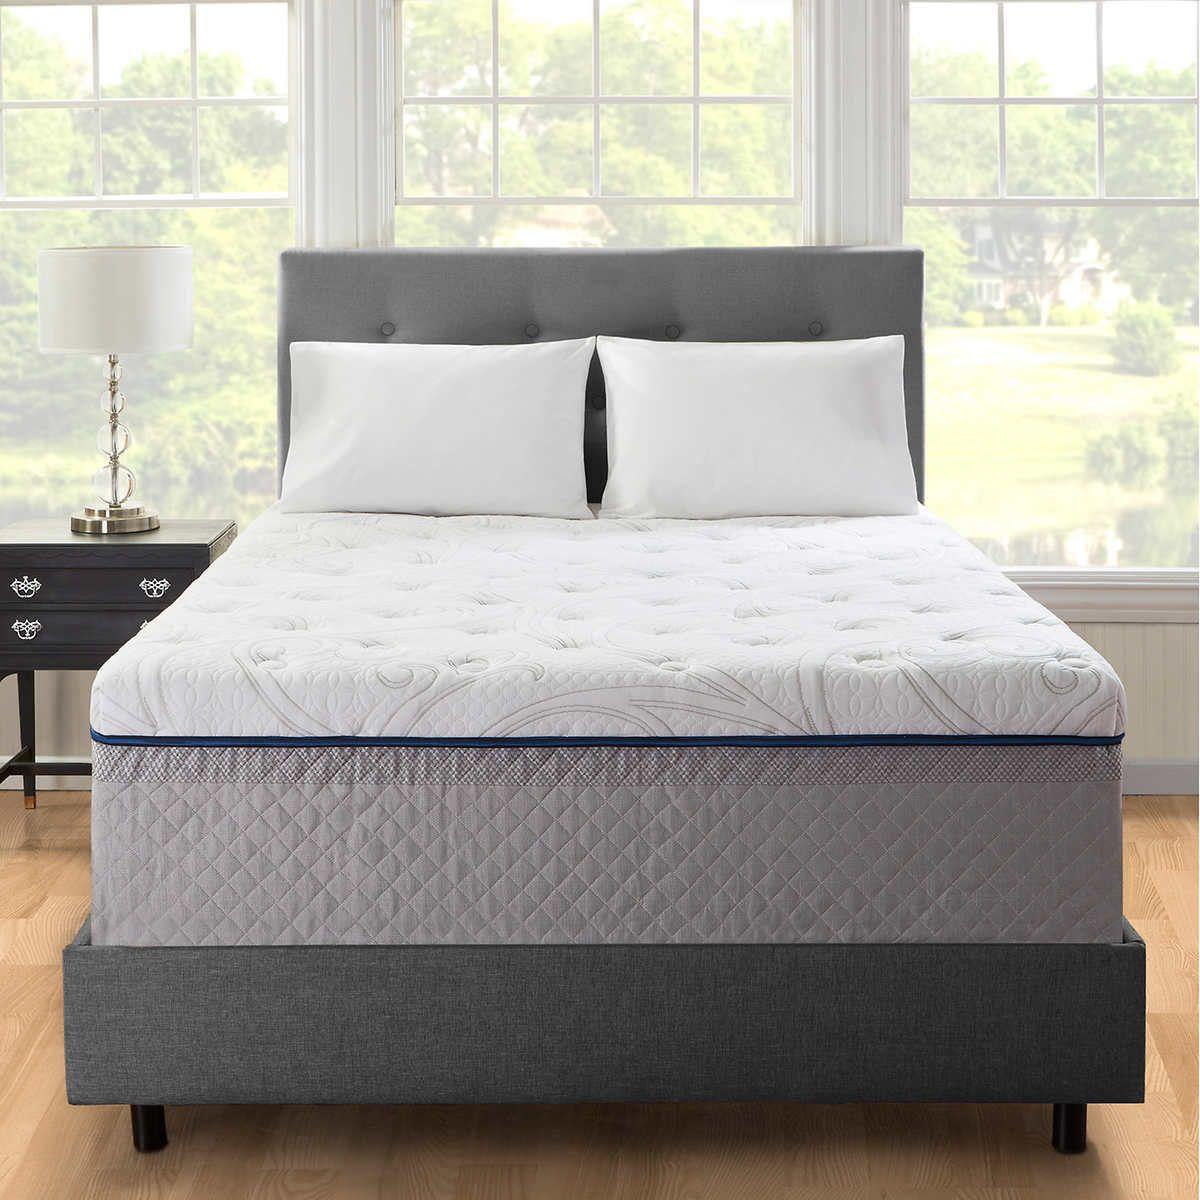 Pin by Payton Suter on home Foam mattress, Memory foam